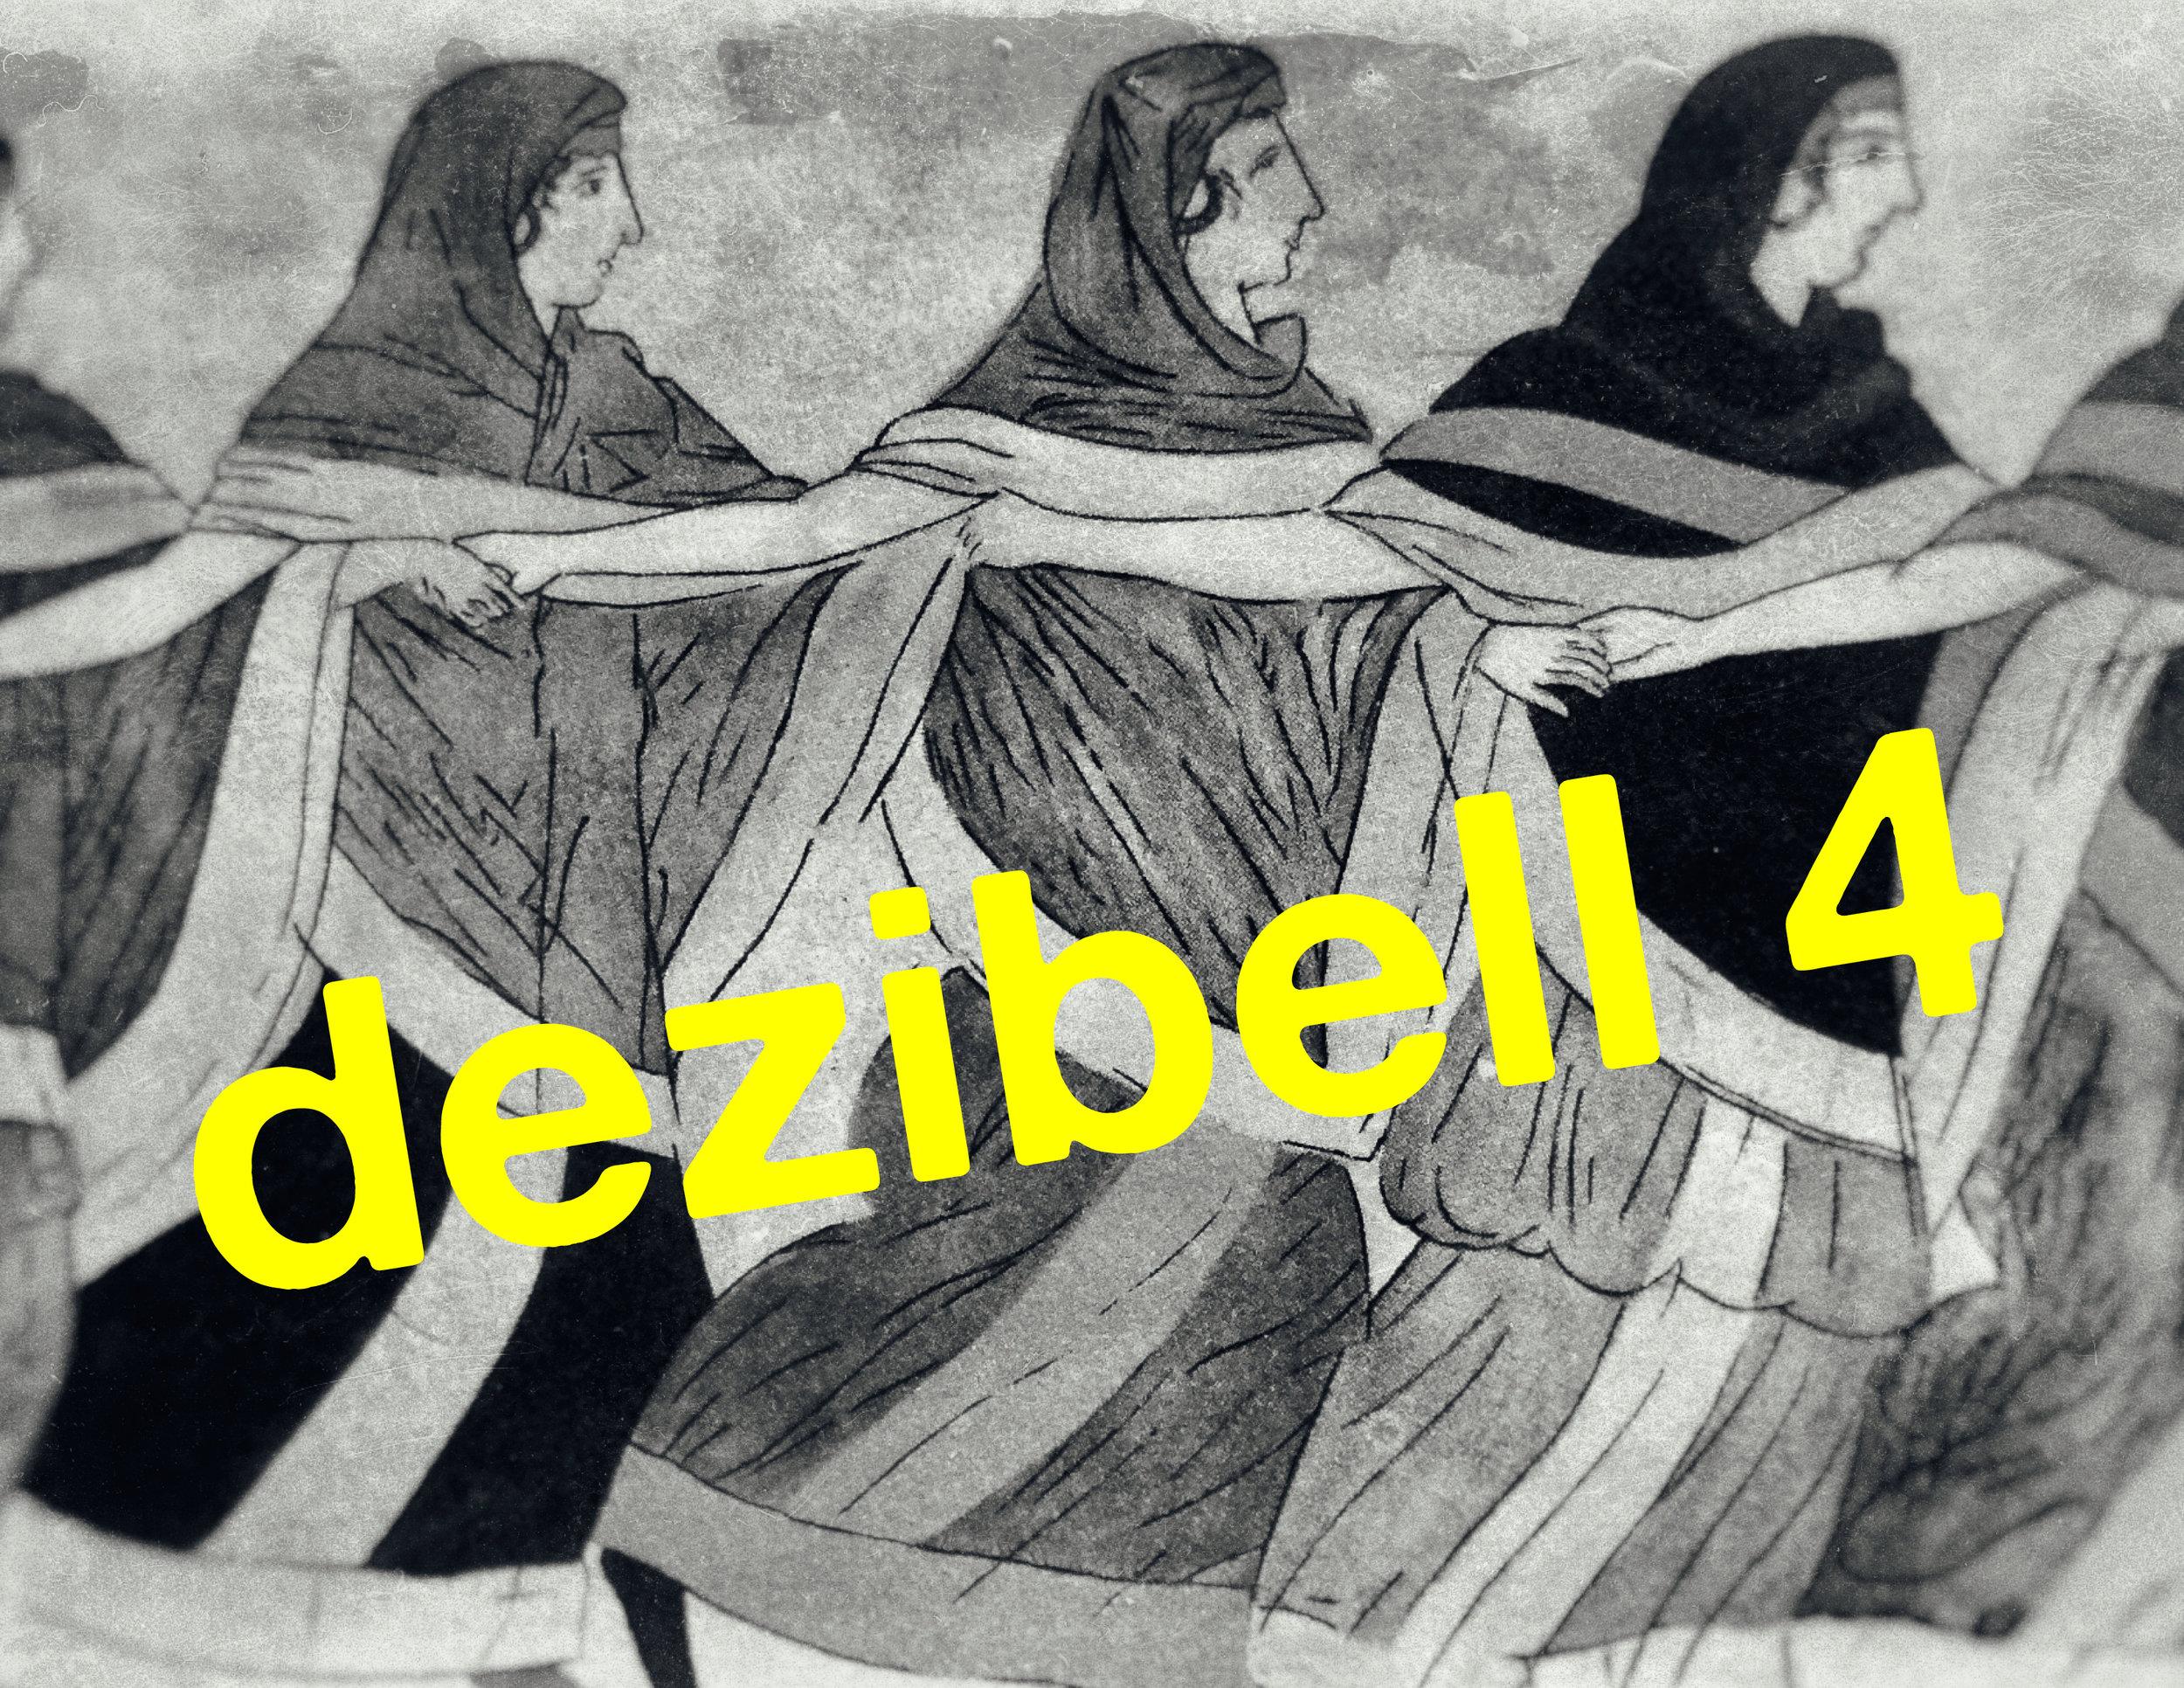 dezibell4.jpg